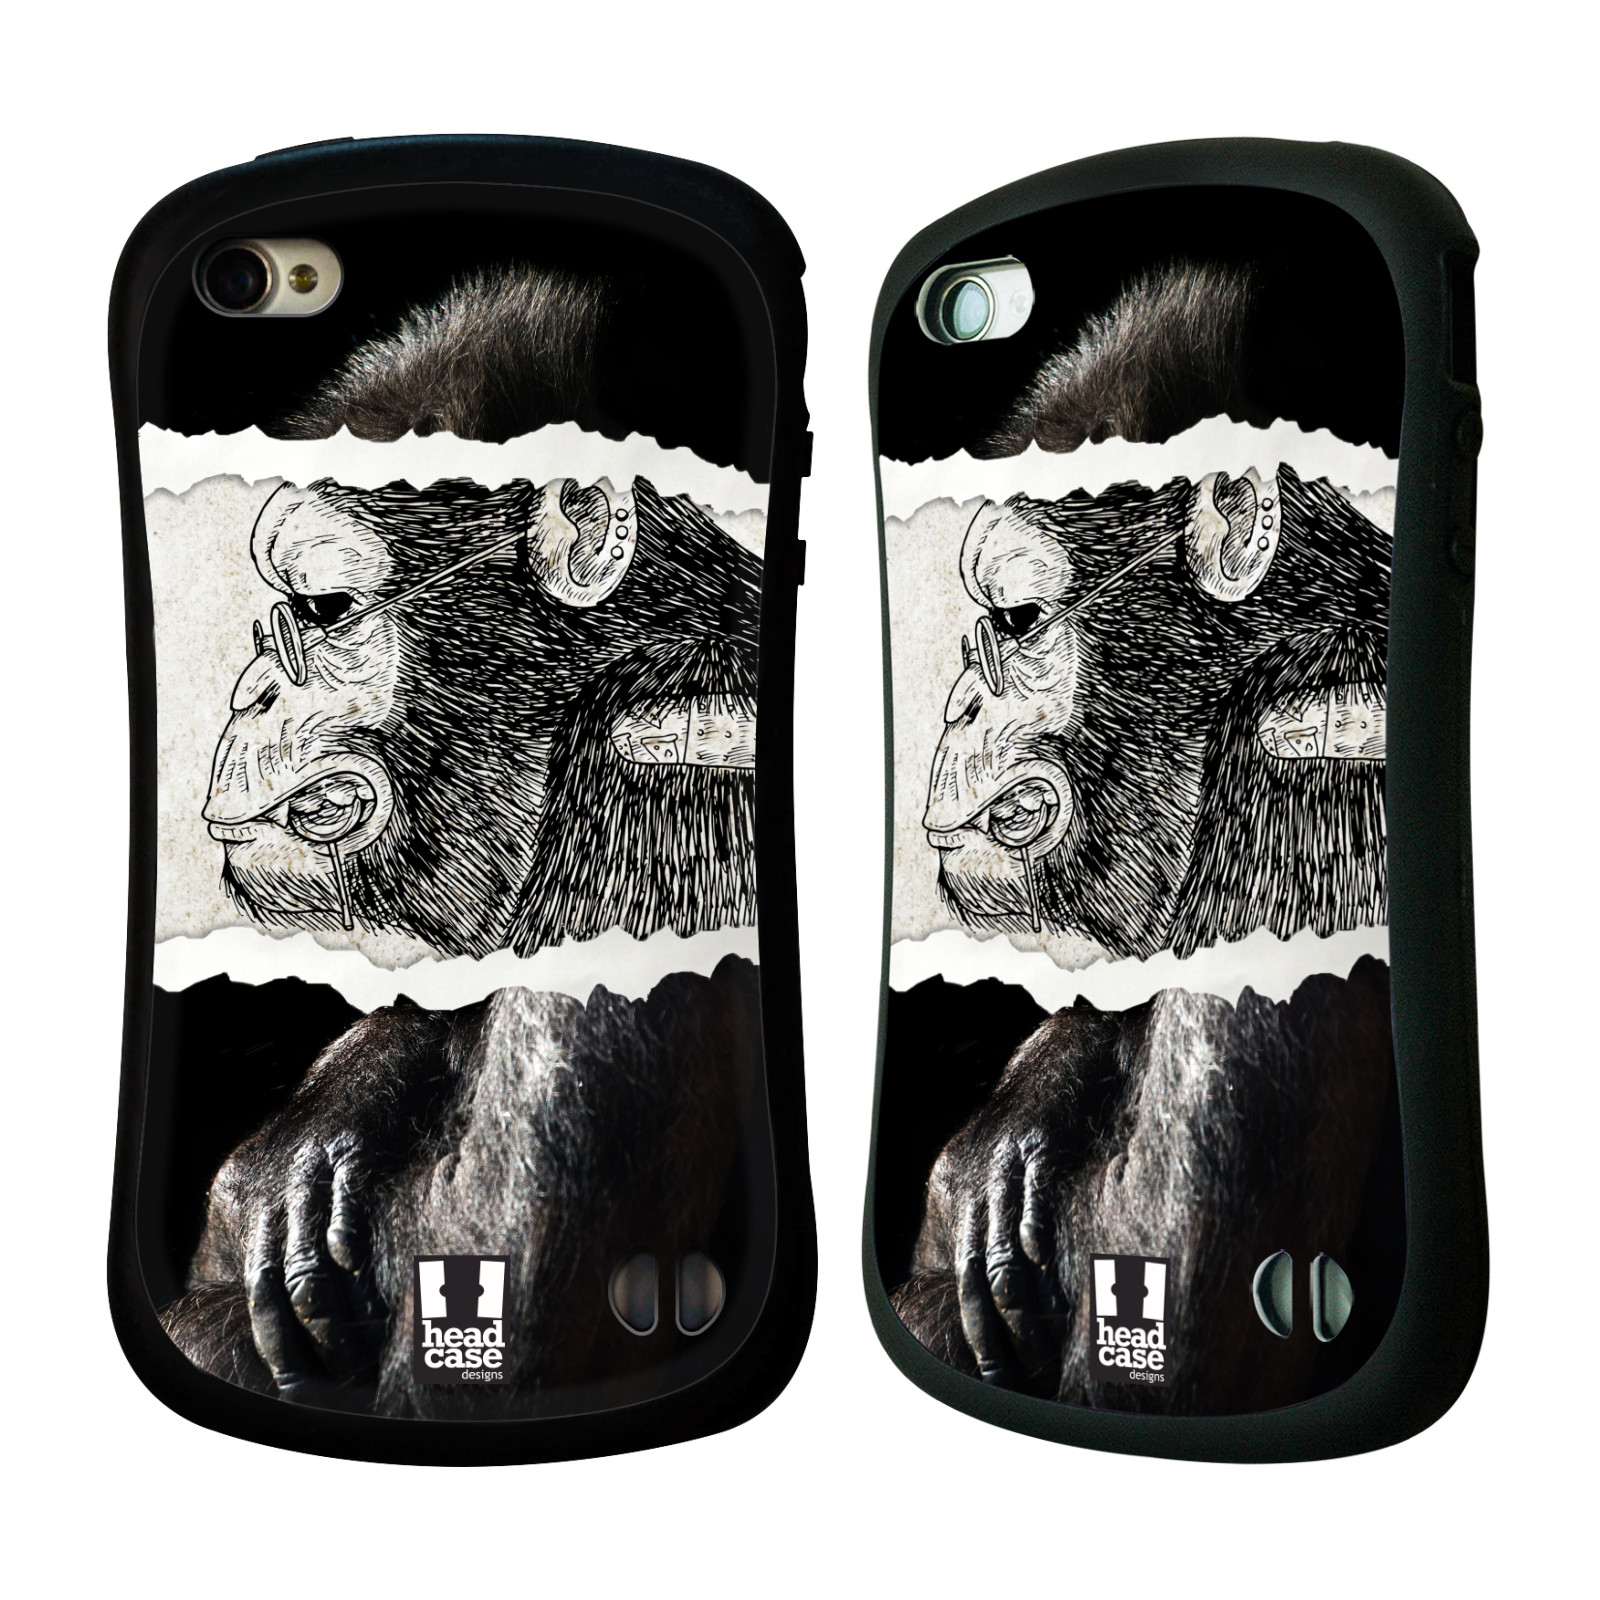 HEAD CASE silikon/plast odolný obal na mobil Apple Iphone 4/4S vzor zvířata koláž opice